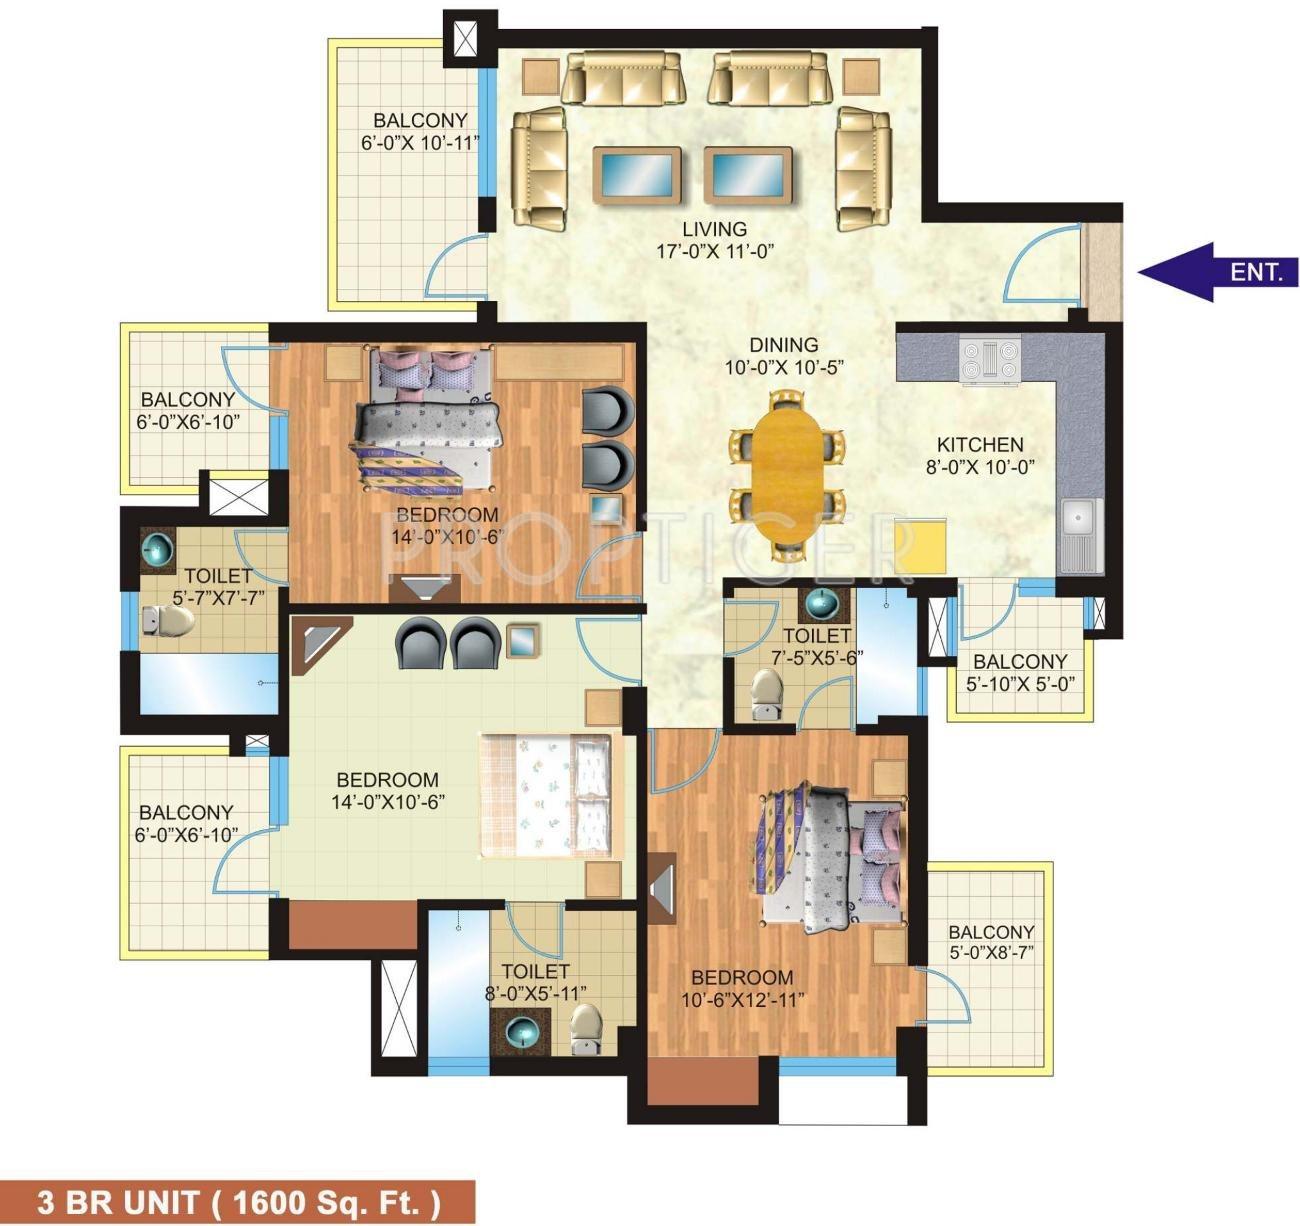 Klj heights in sector 15 bahadurgarh jhajjar price for 1200 post oak floor plans